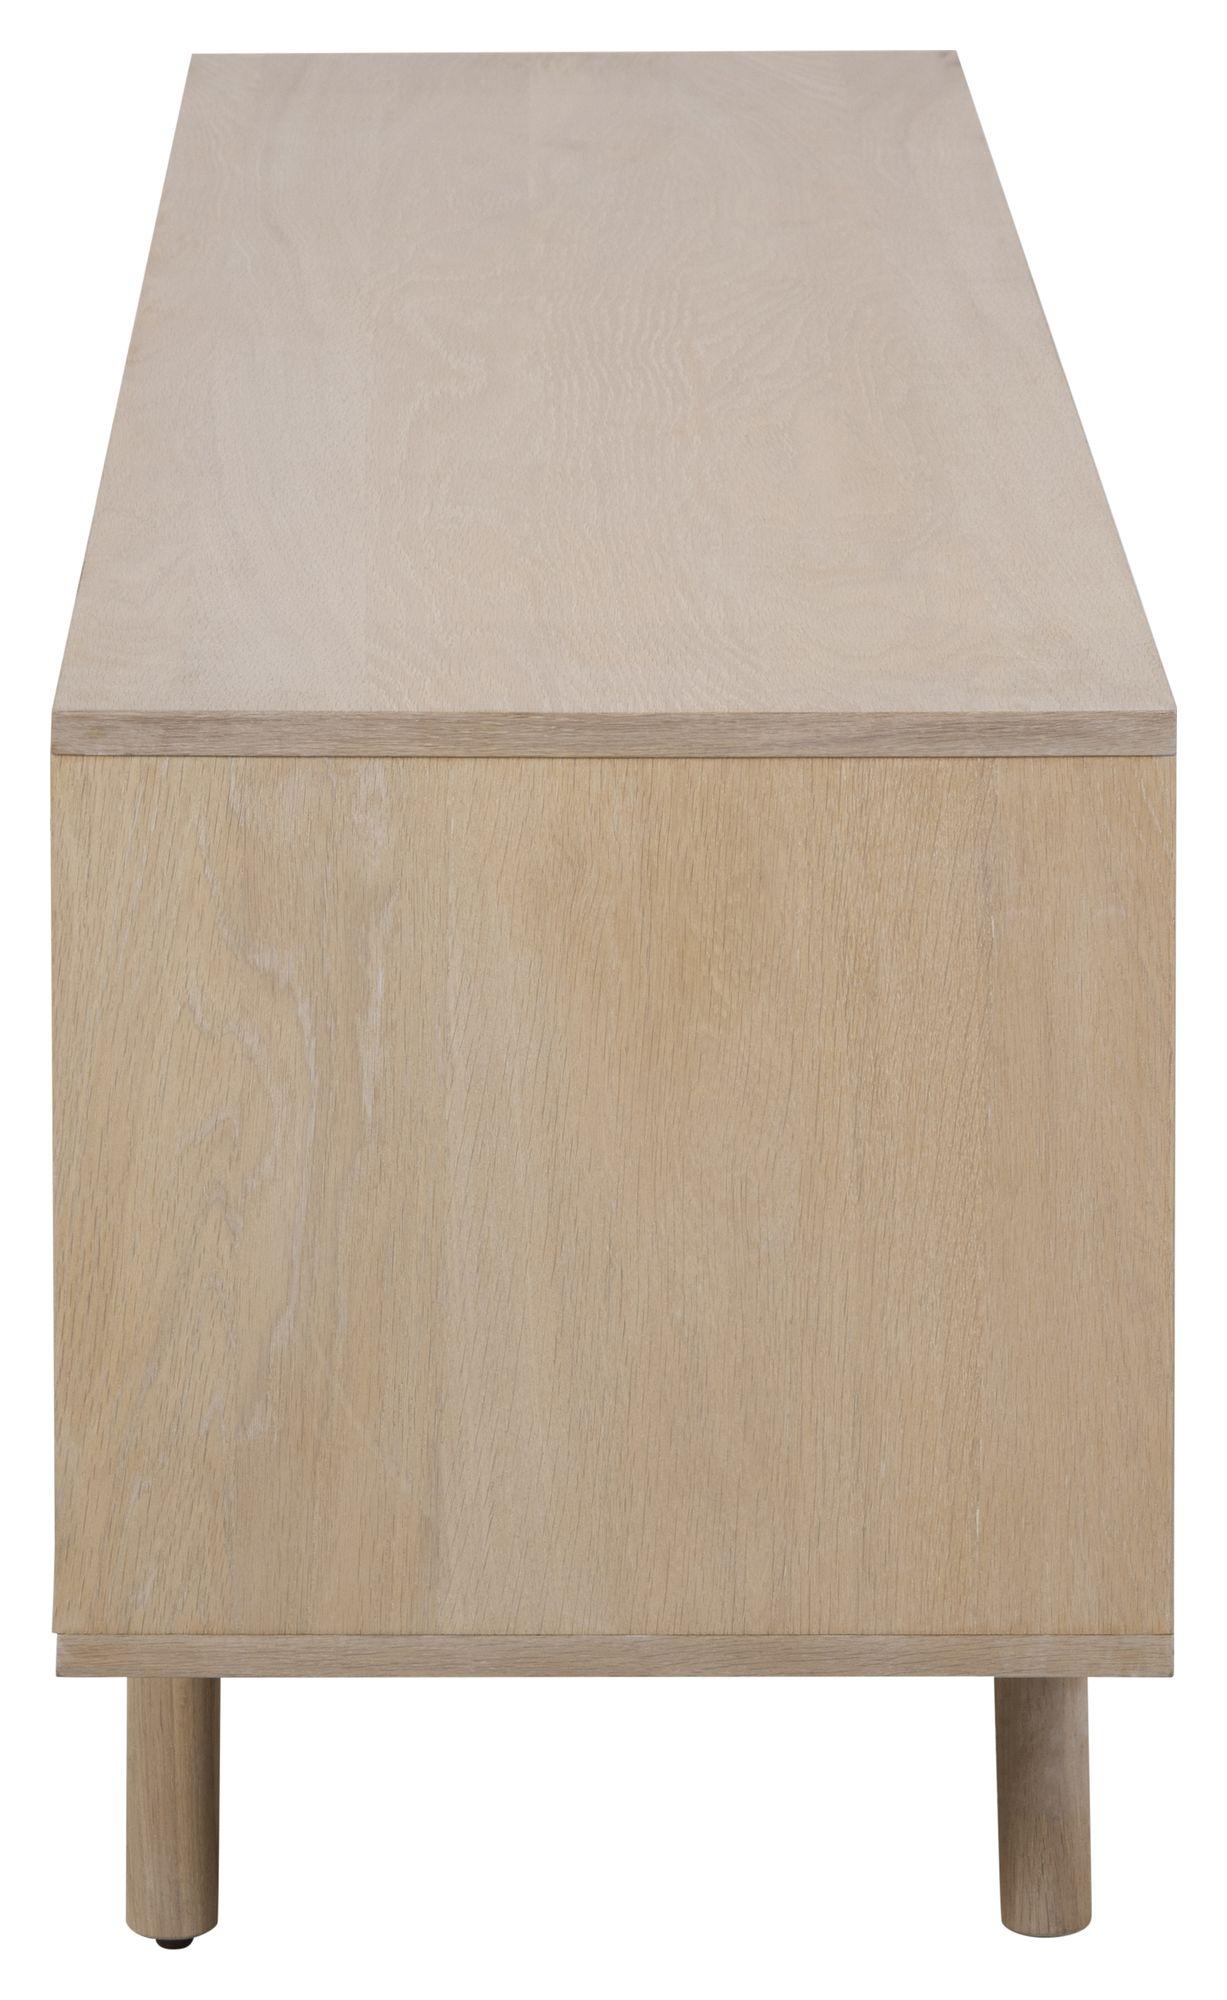 Aliva Tv-bord - Hvidpigment ege finér - TV-bord med skydelåger